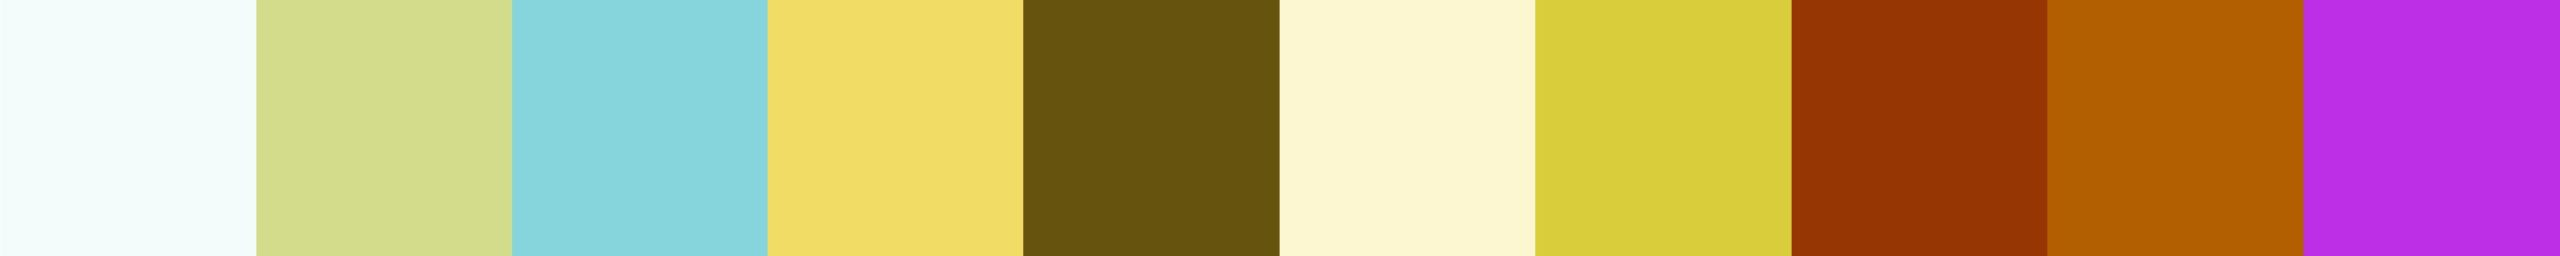 701 Iokamoza Color Palette